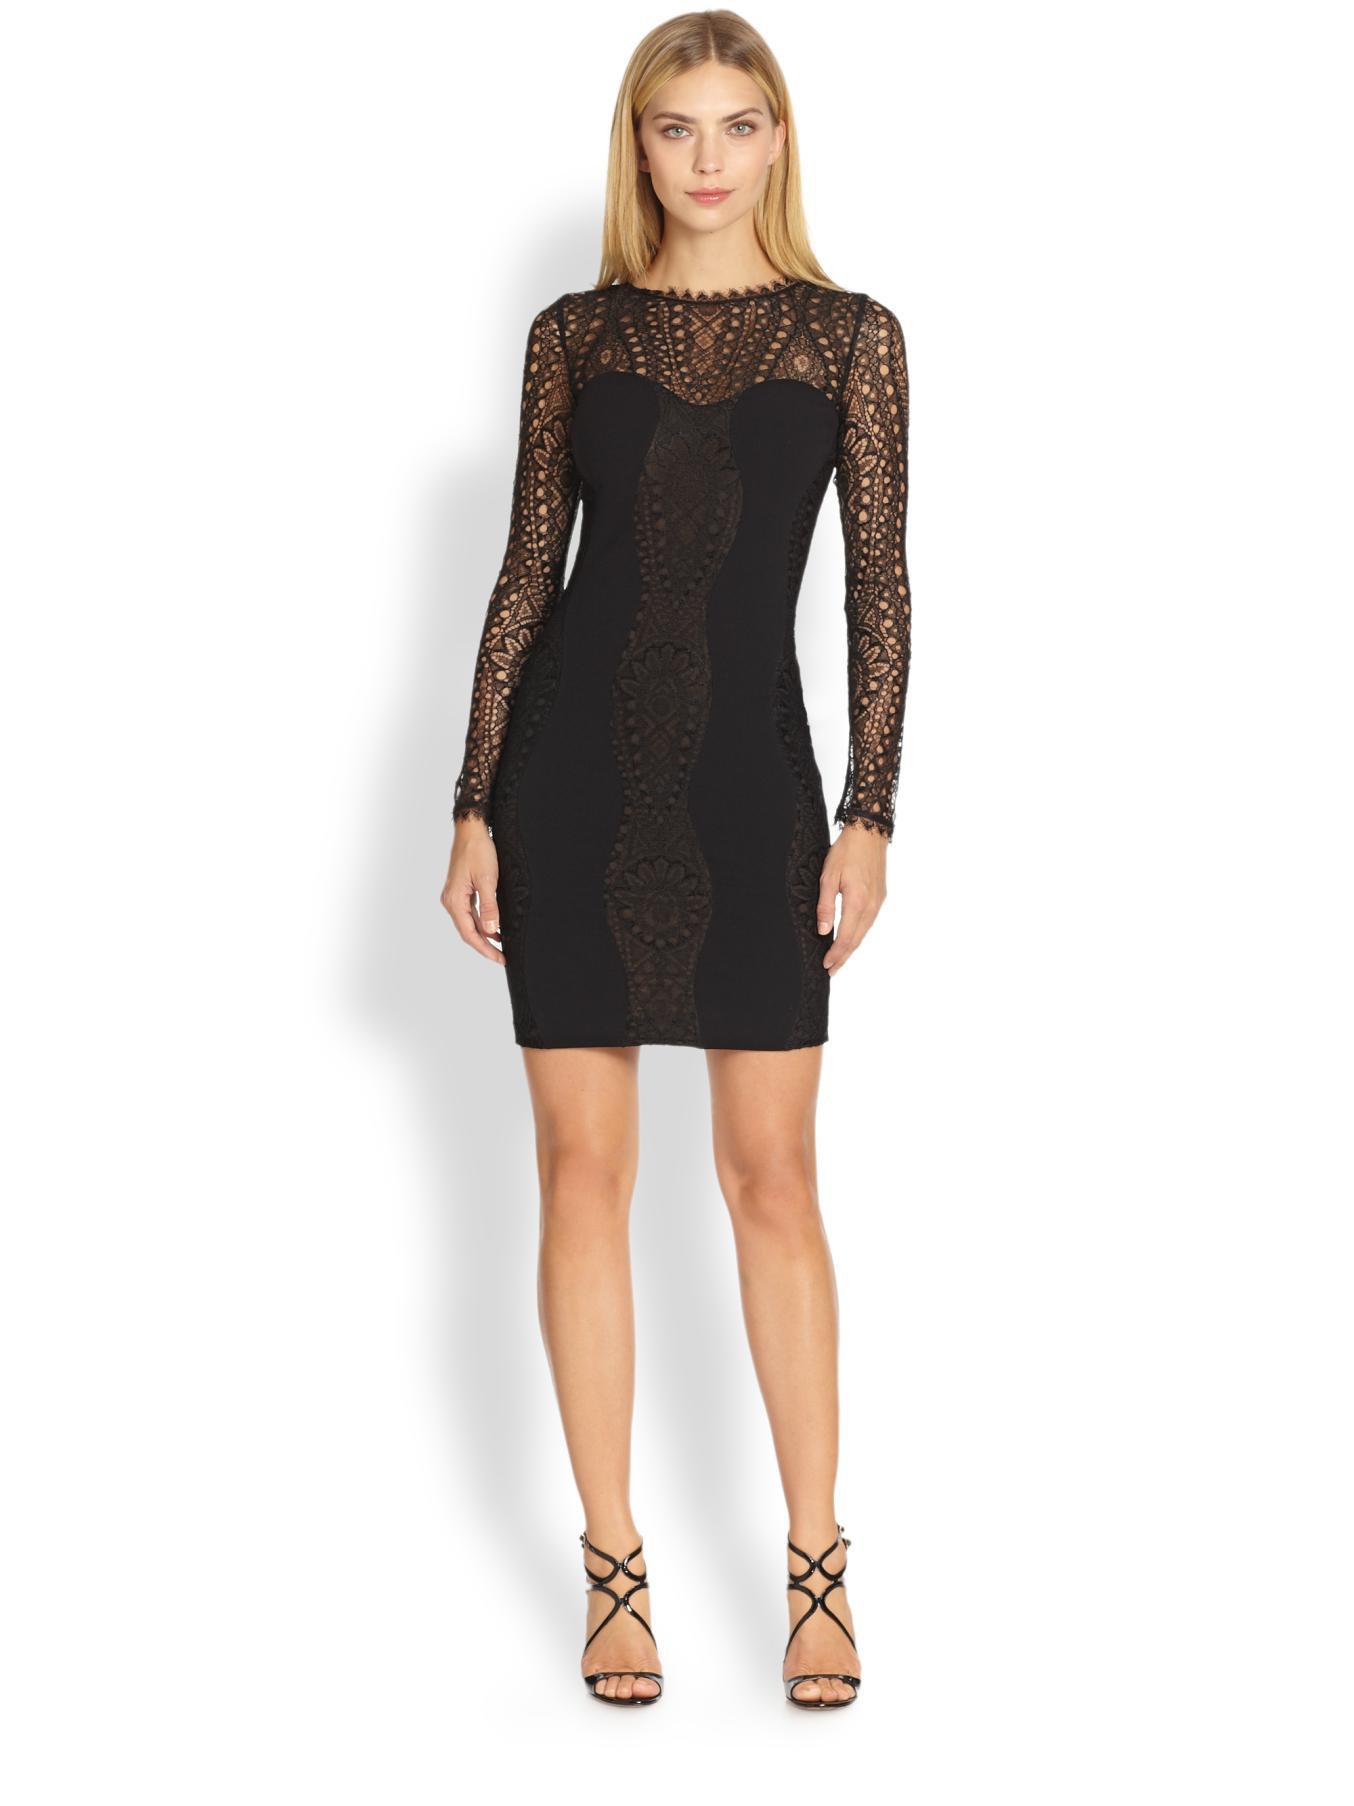 Emilio Pucci Gold Skull Caviar Dress Emilio Pucci Knit Inset Lace